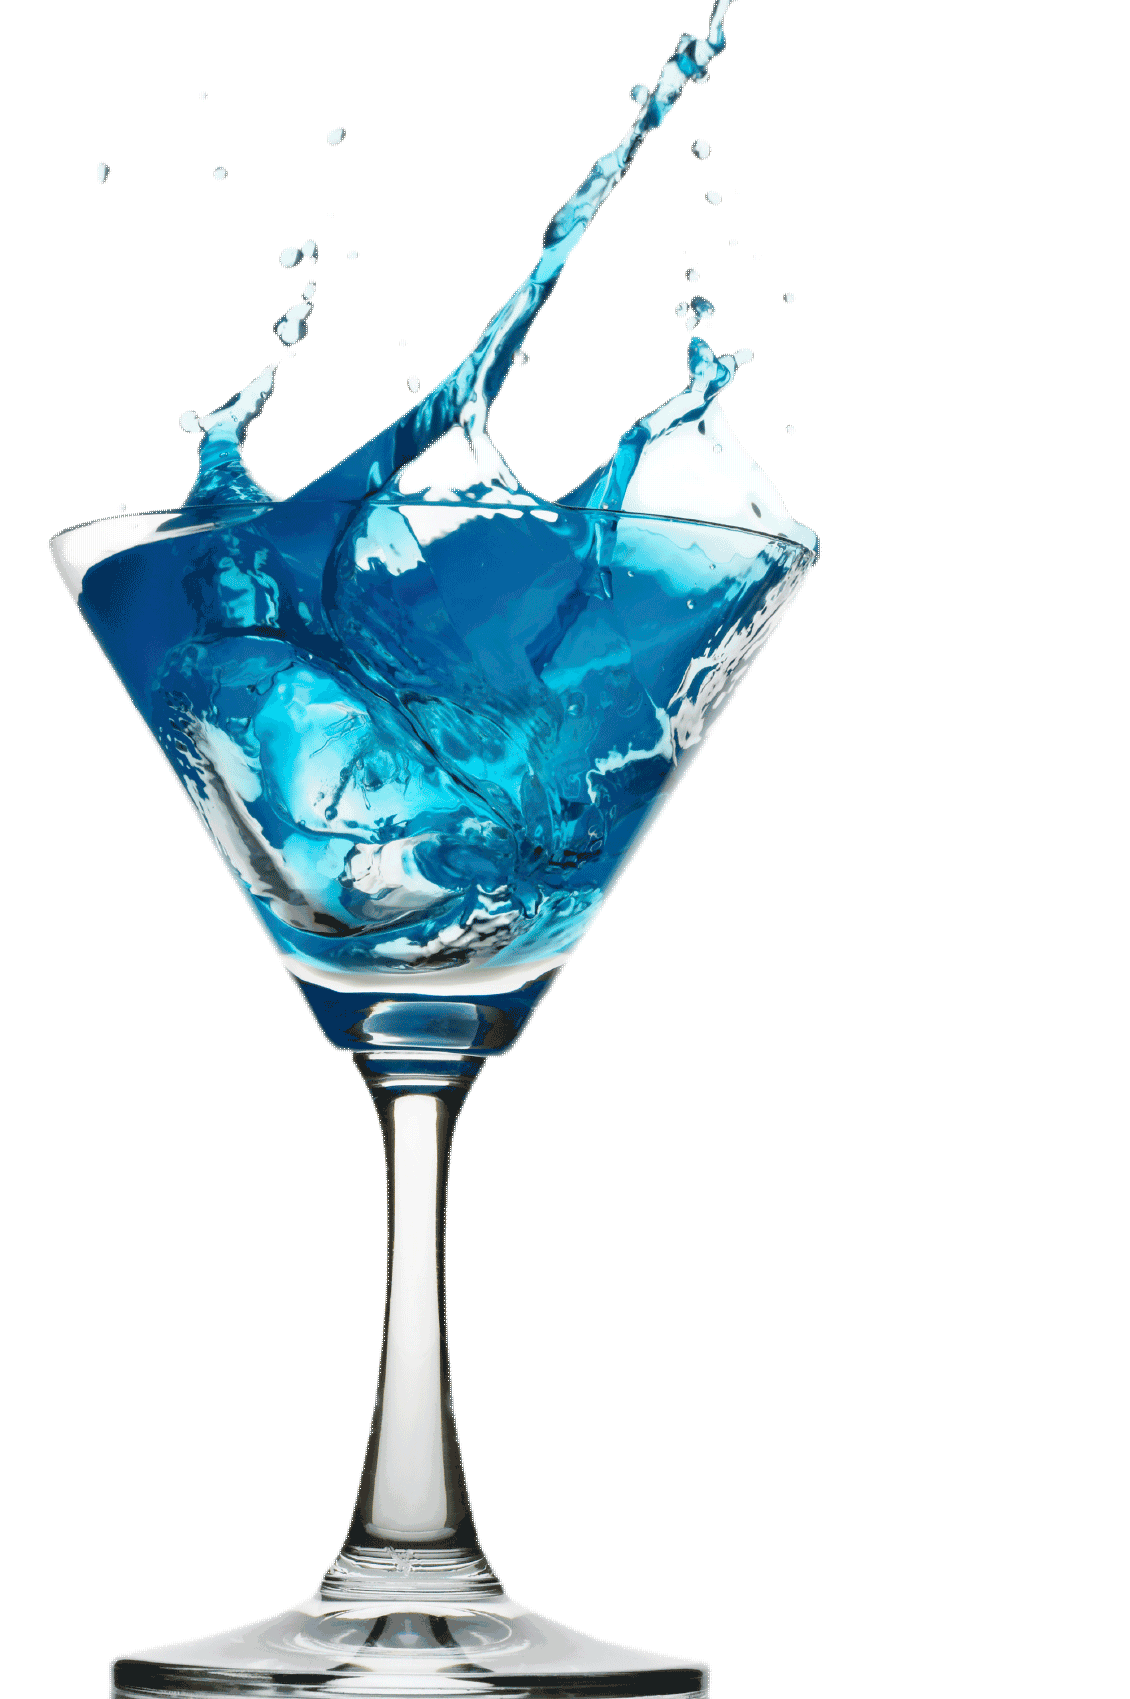 ANTARTIC-cocktail-blue-lagoon-coctel-Laguna-Azul-04